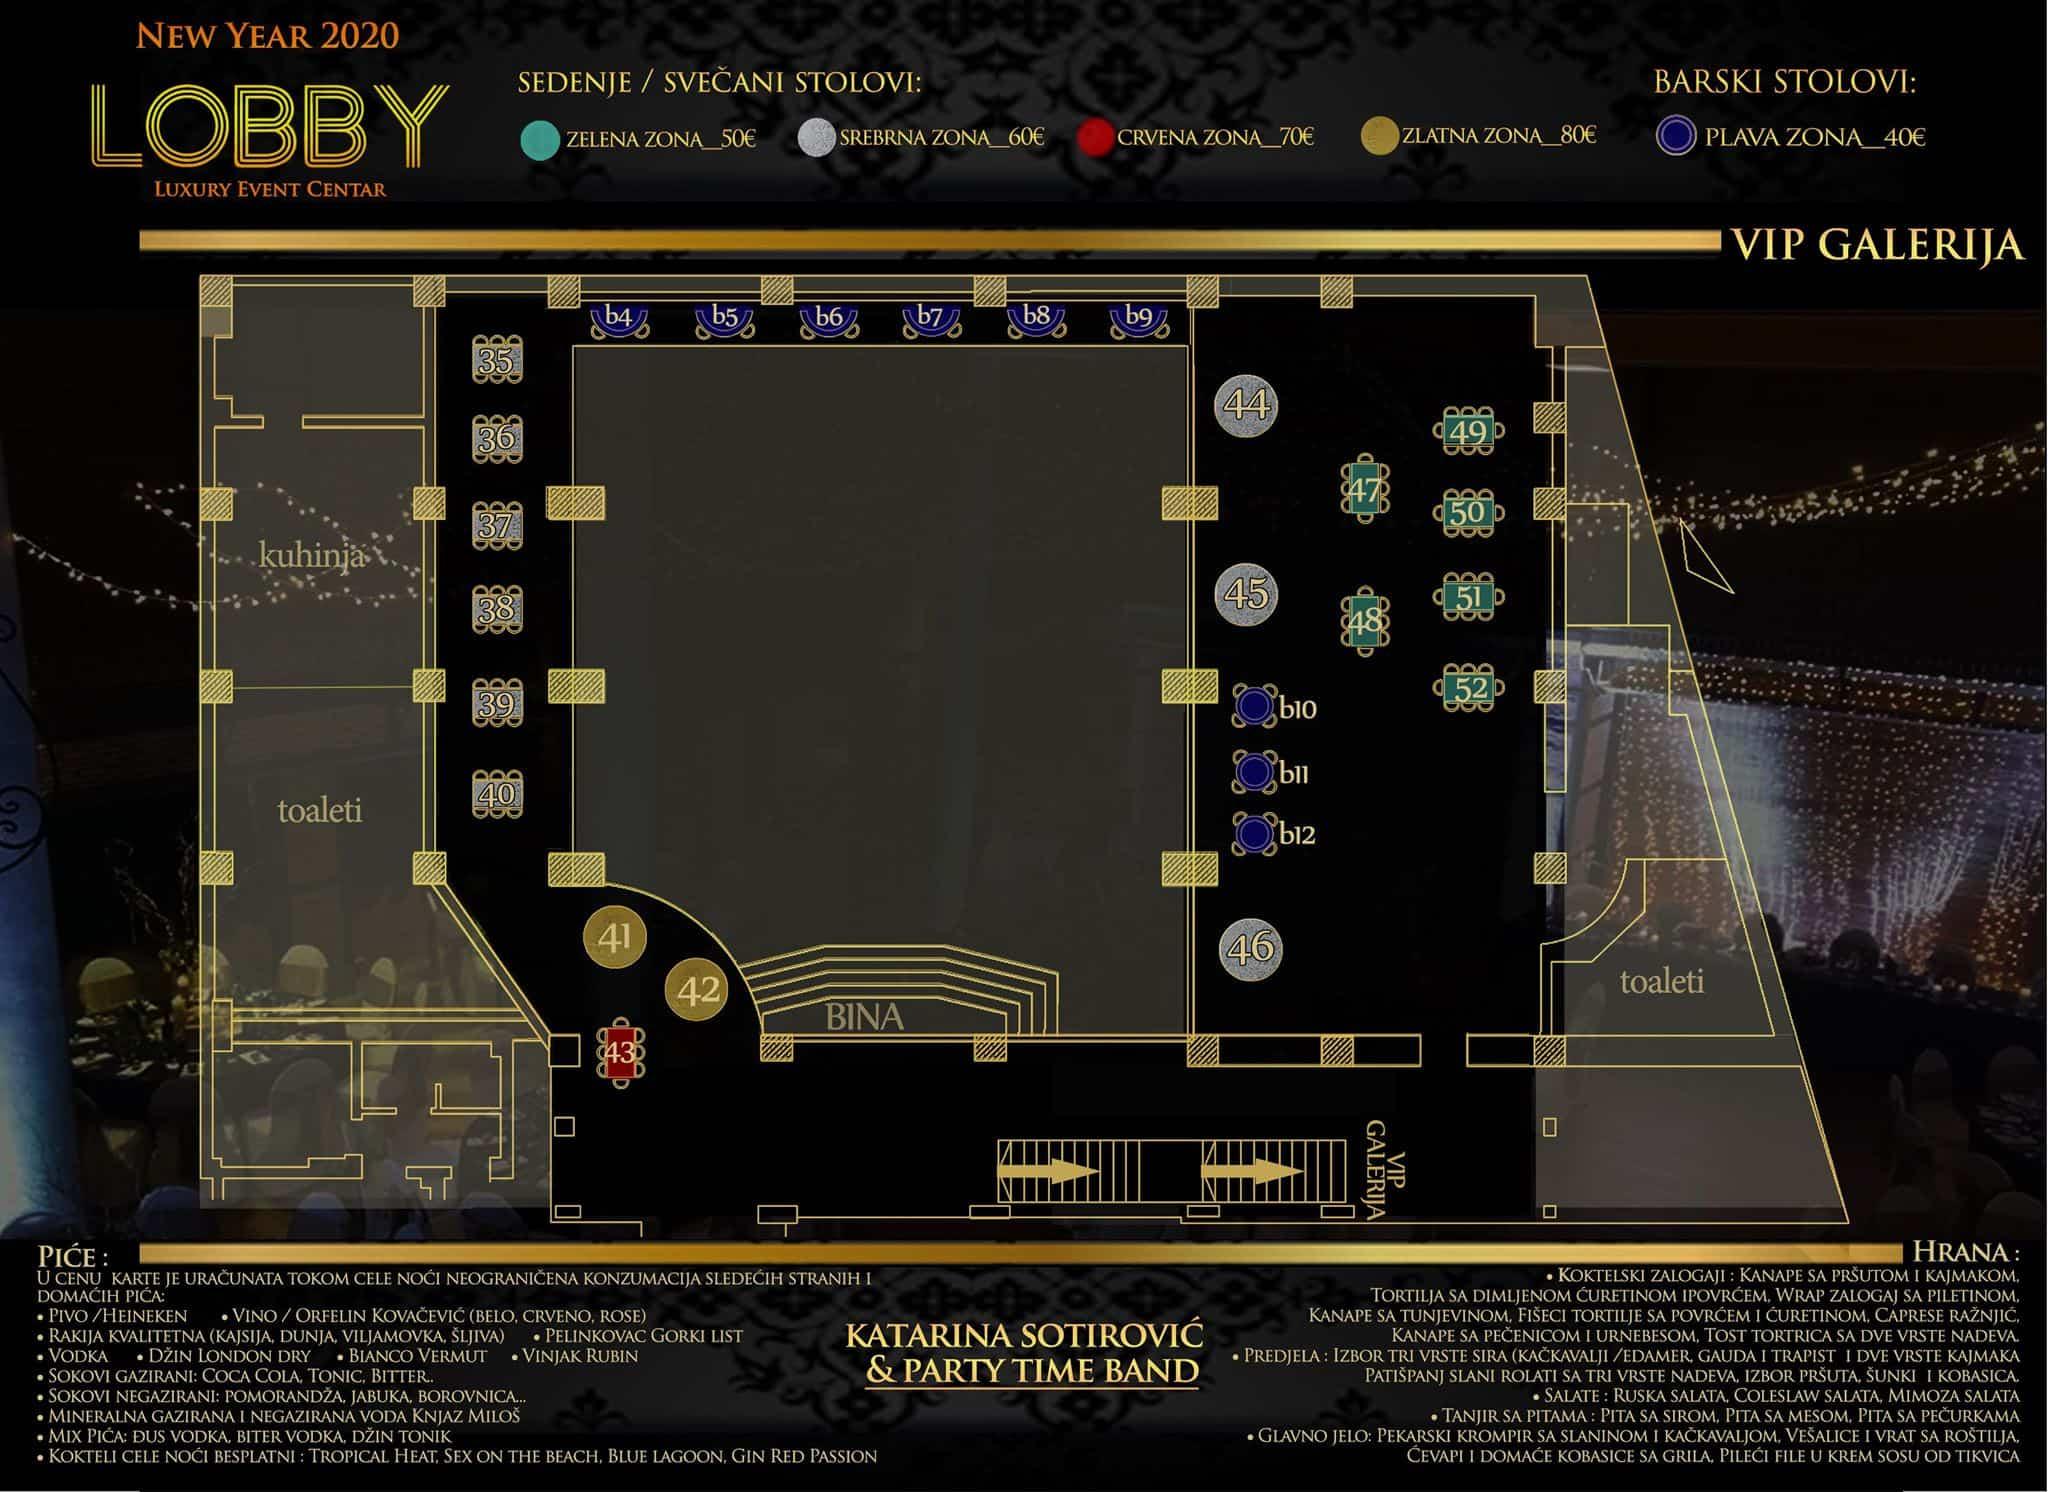 Docek Nove godine Beograd 2020 Lobby Event Center mapa 2